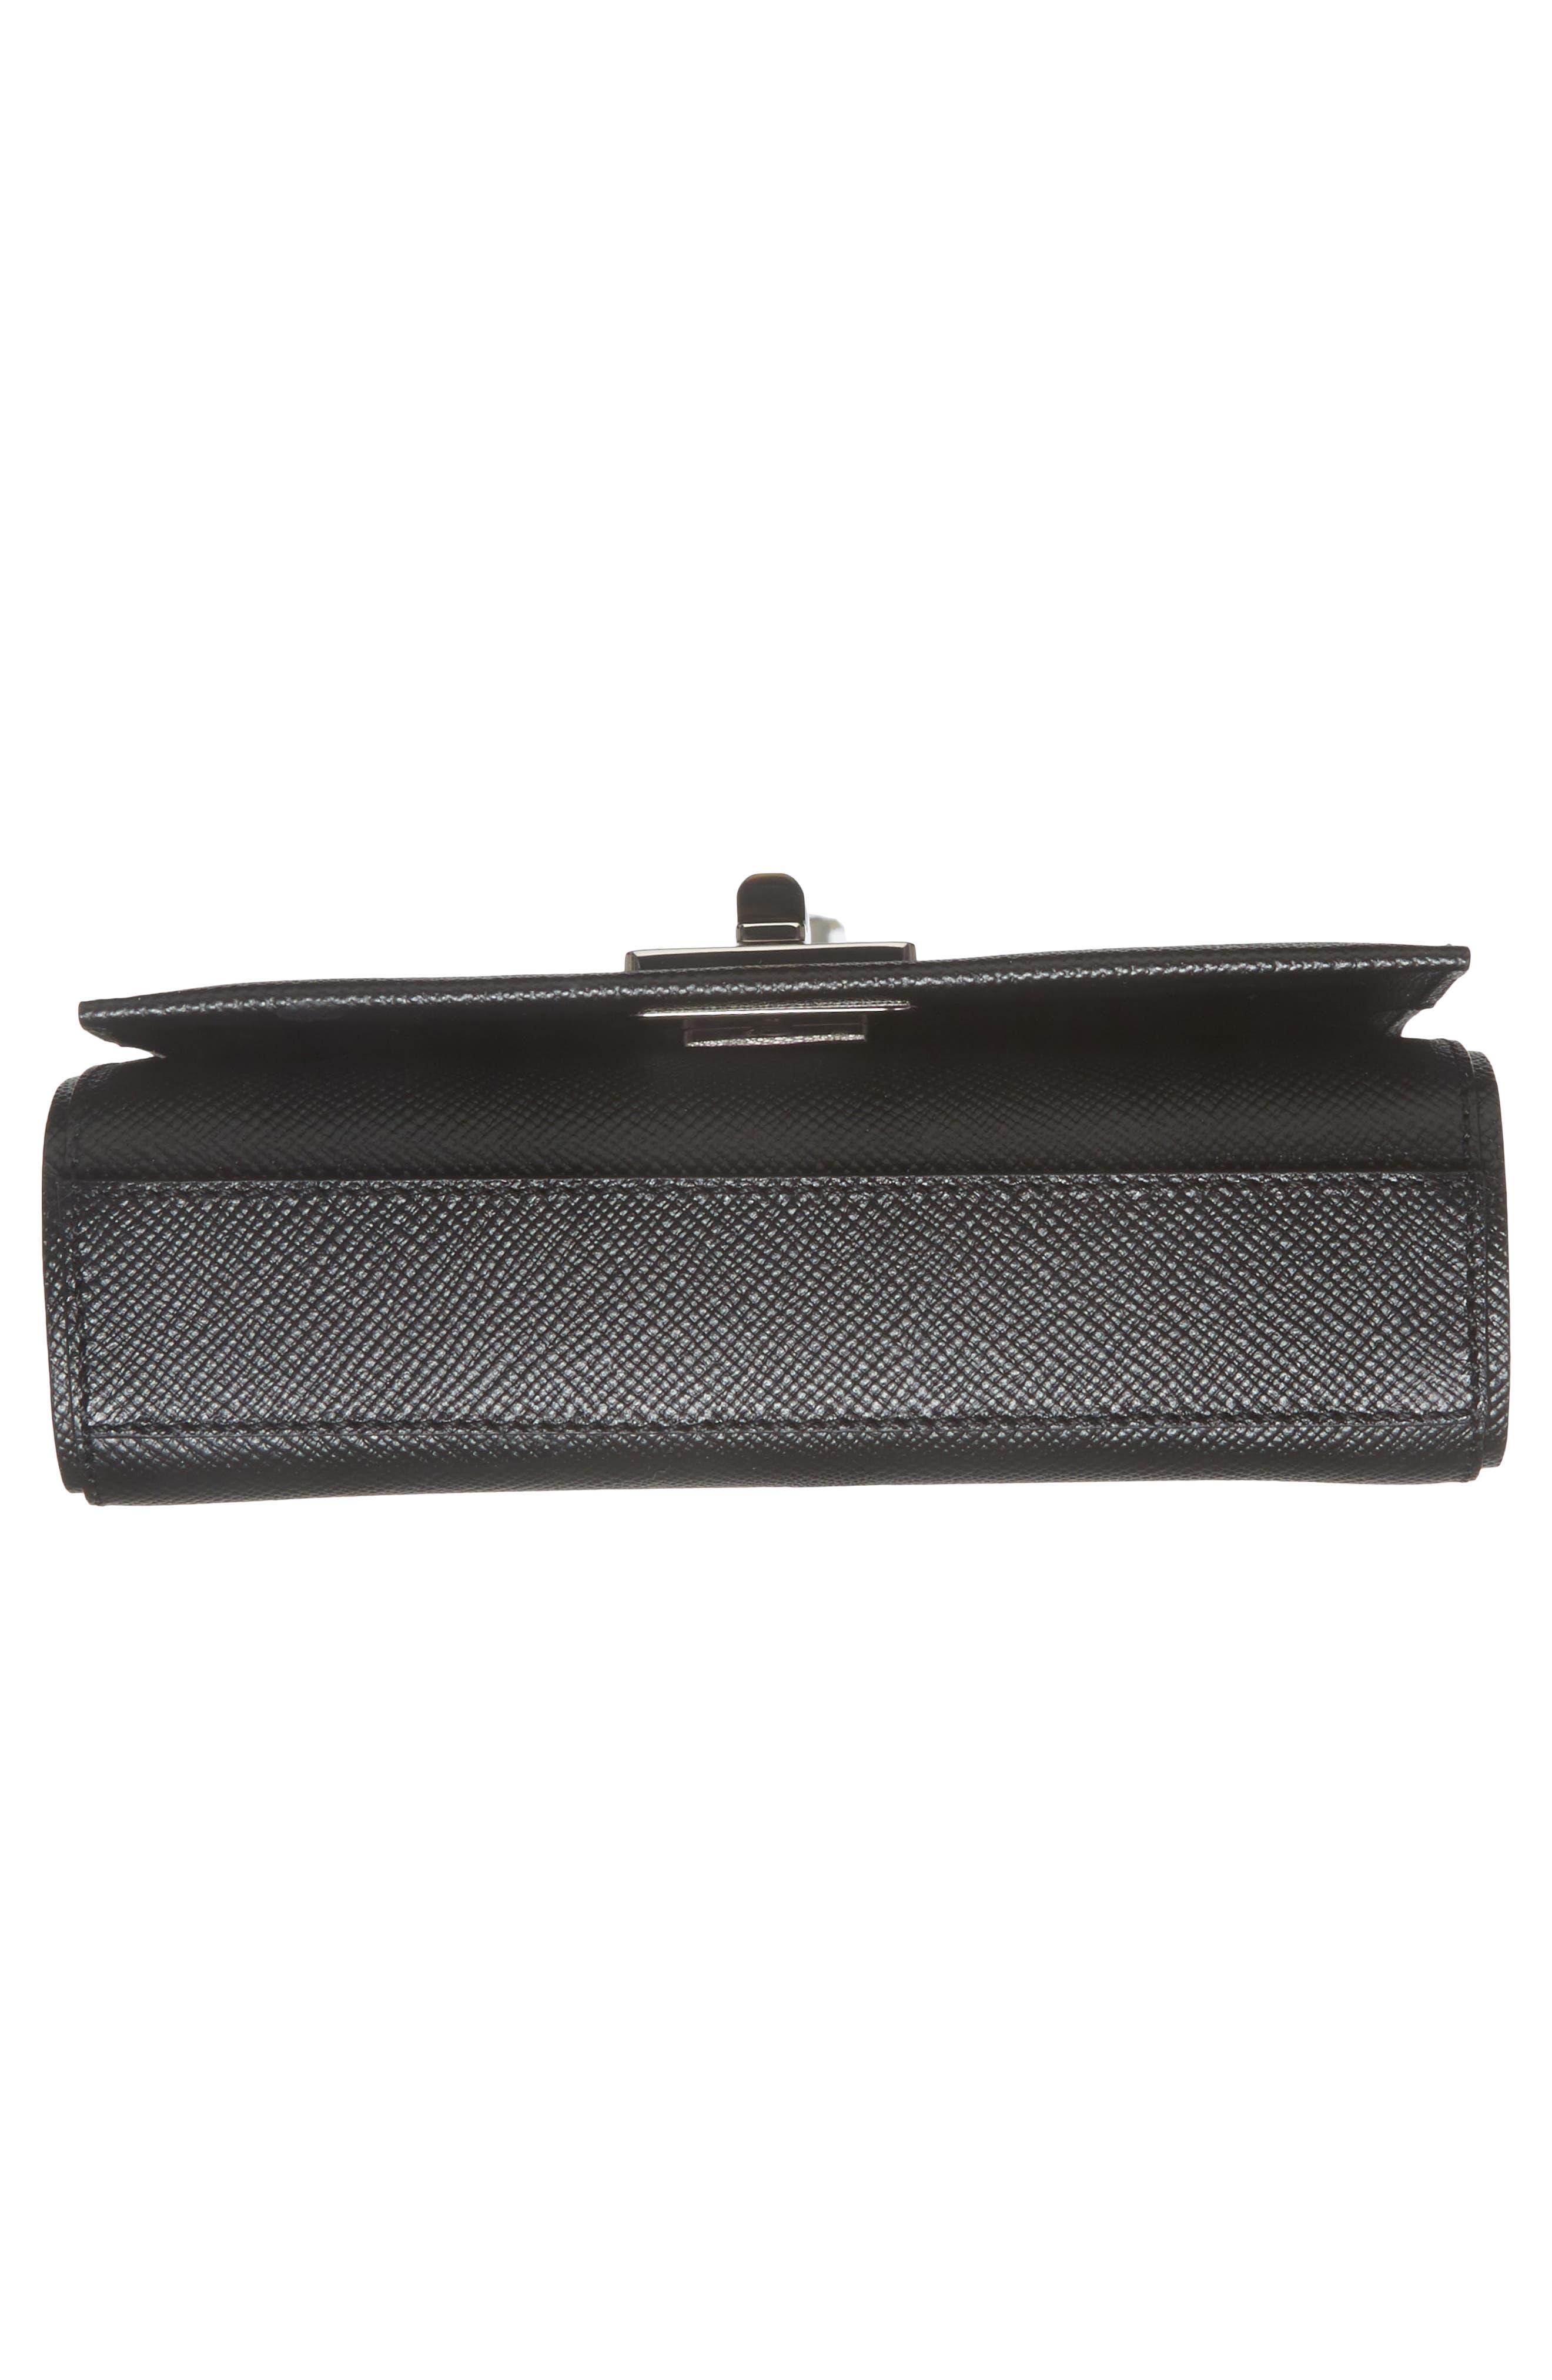 Mini Ilenea Leather Crossbody Bag,                             Alternate thumbnail 7, color,                             001